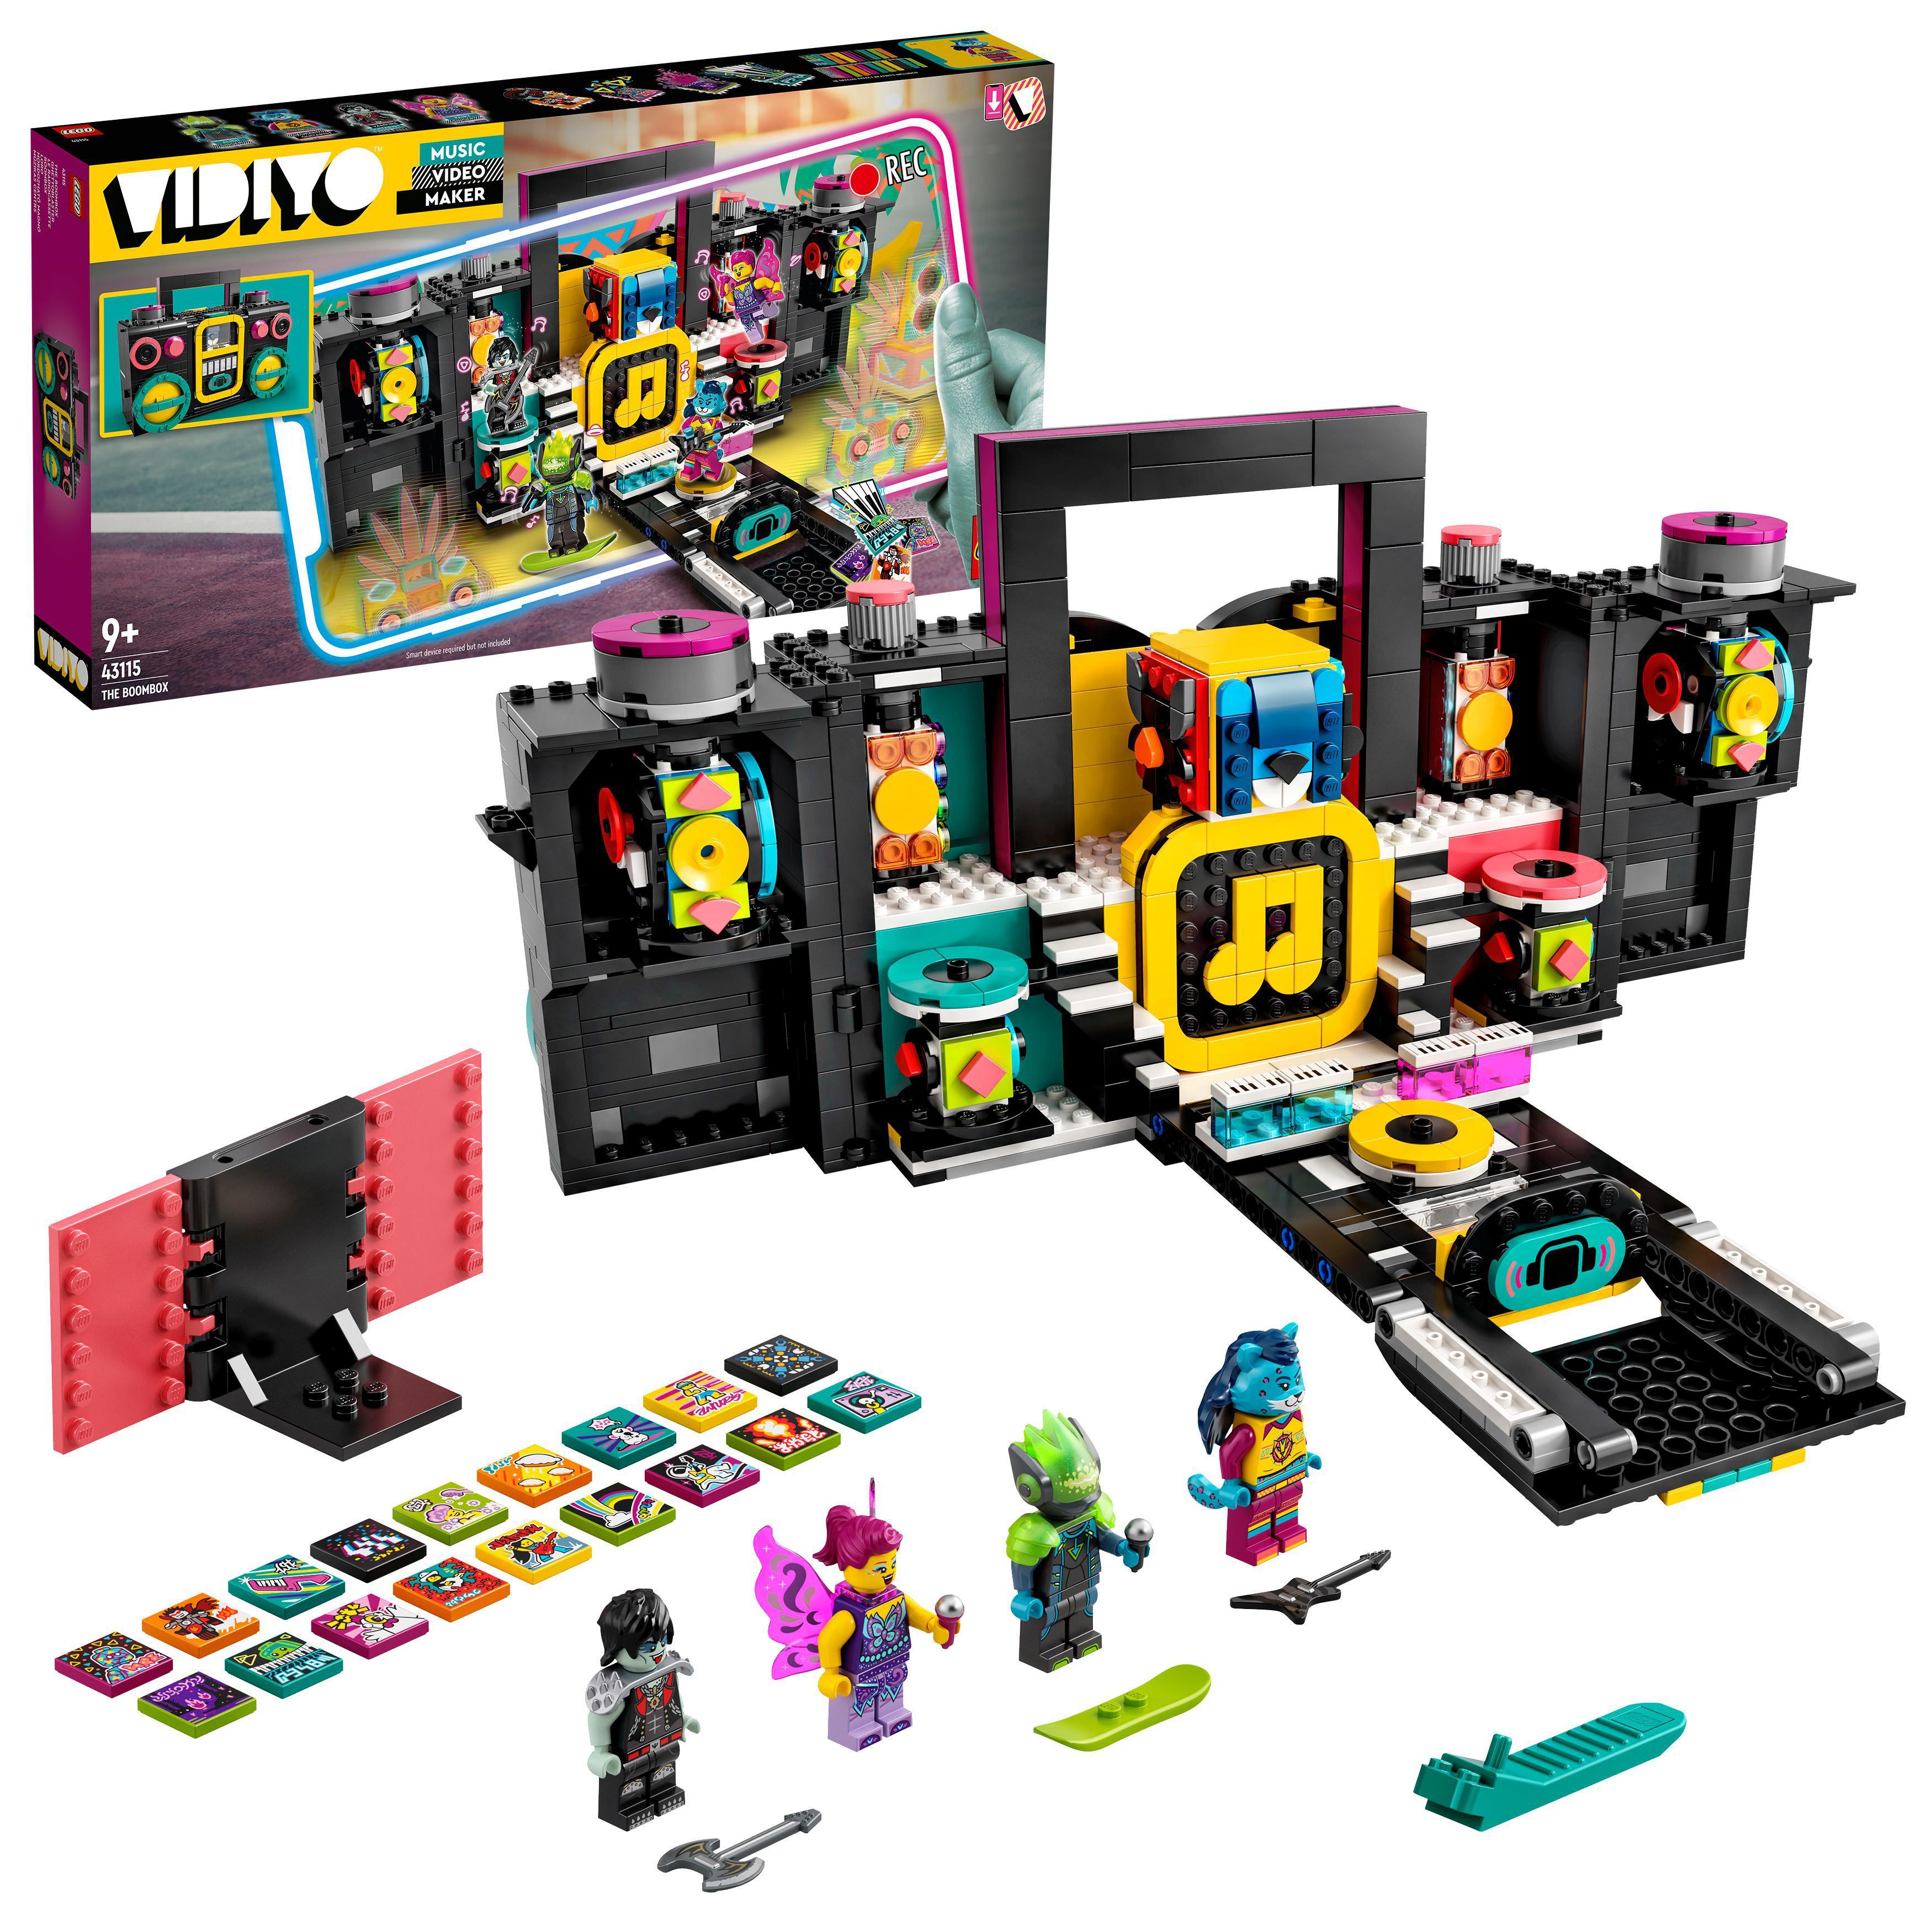 LEGO VIDIYO - The Boombox (43115)